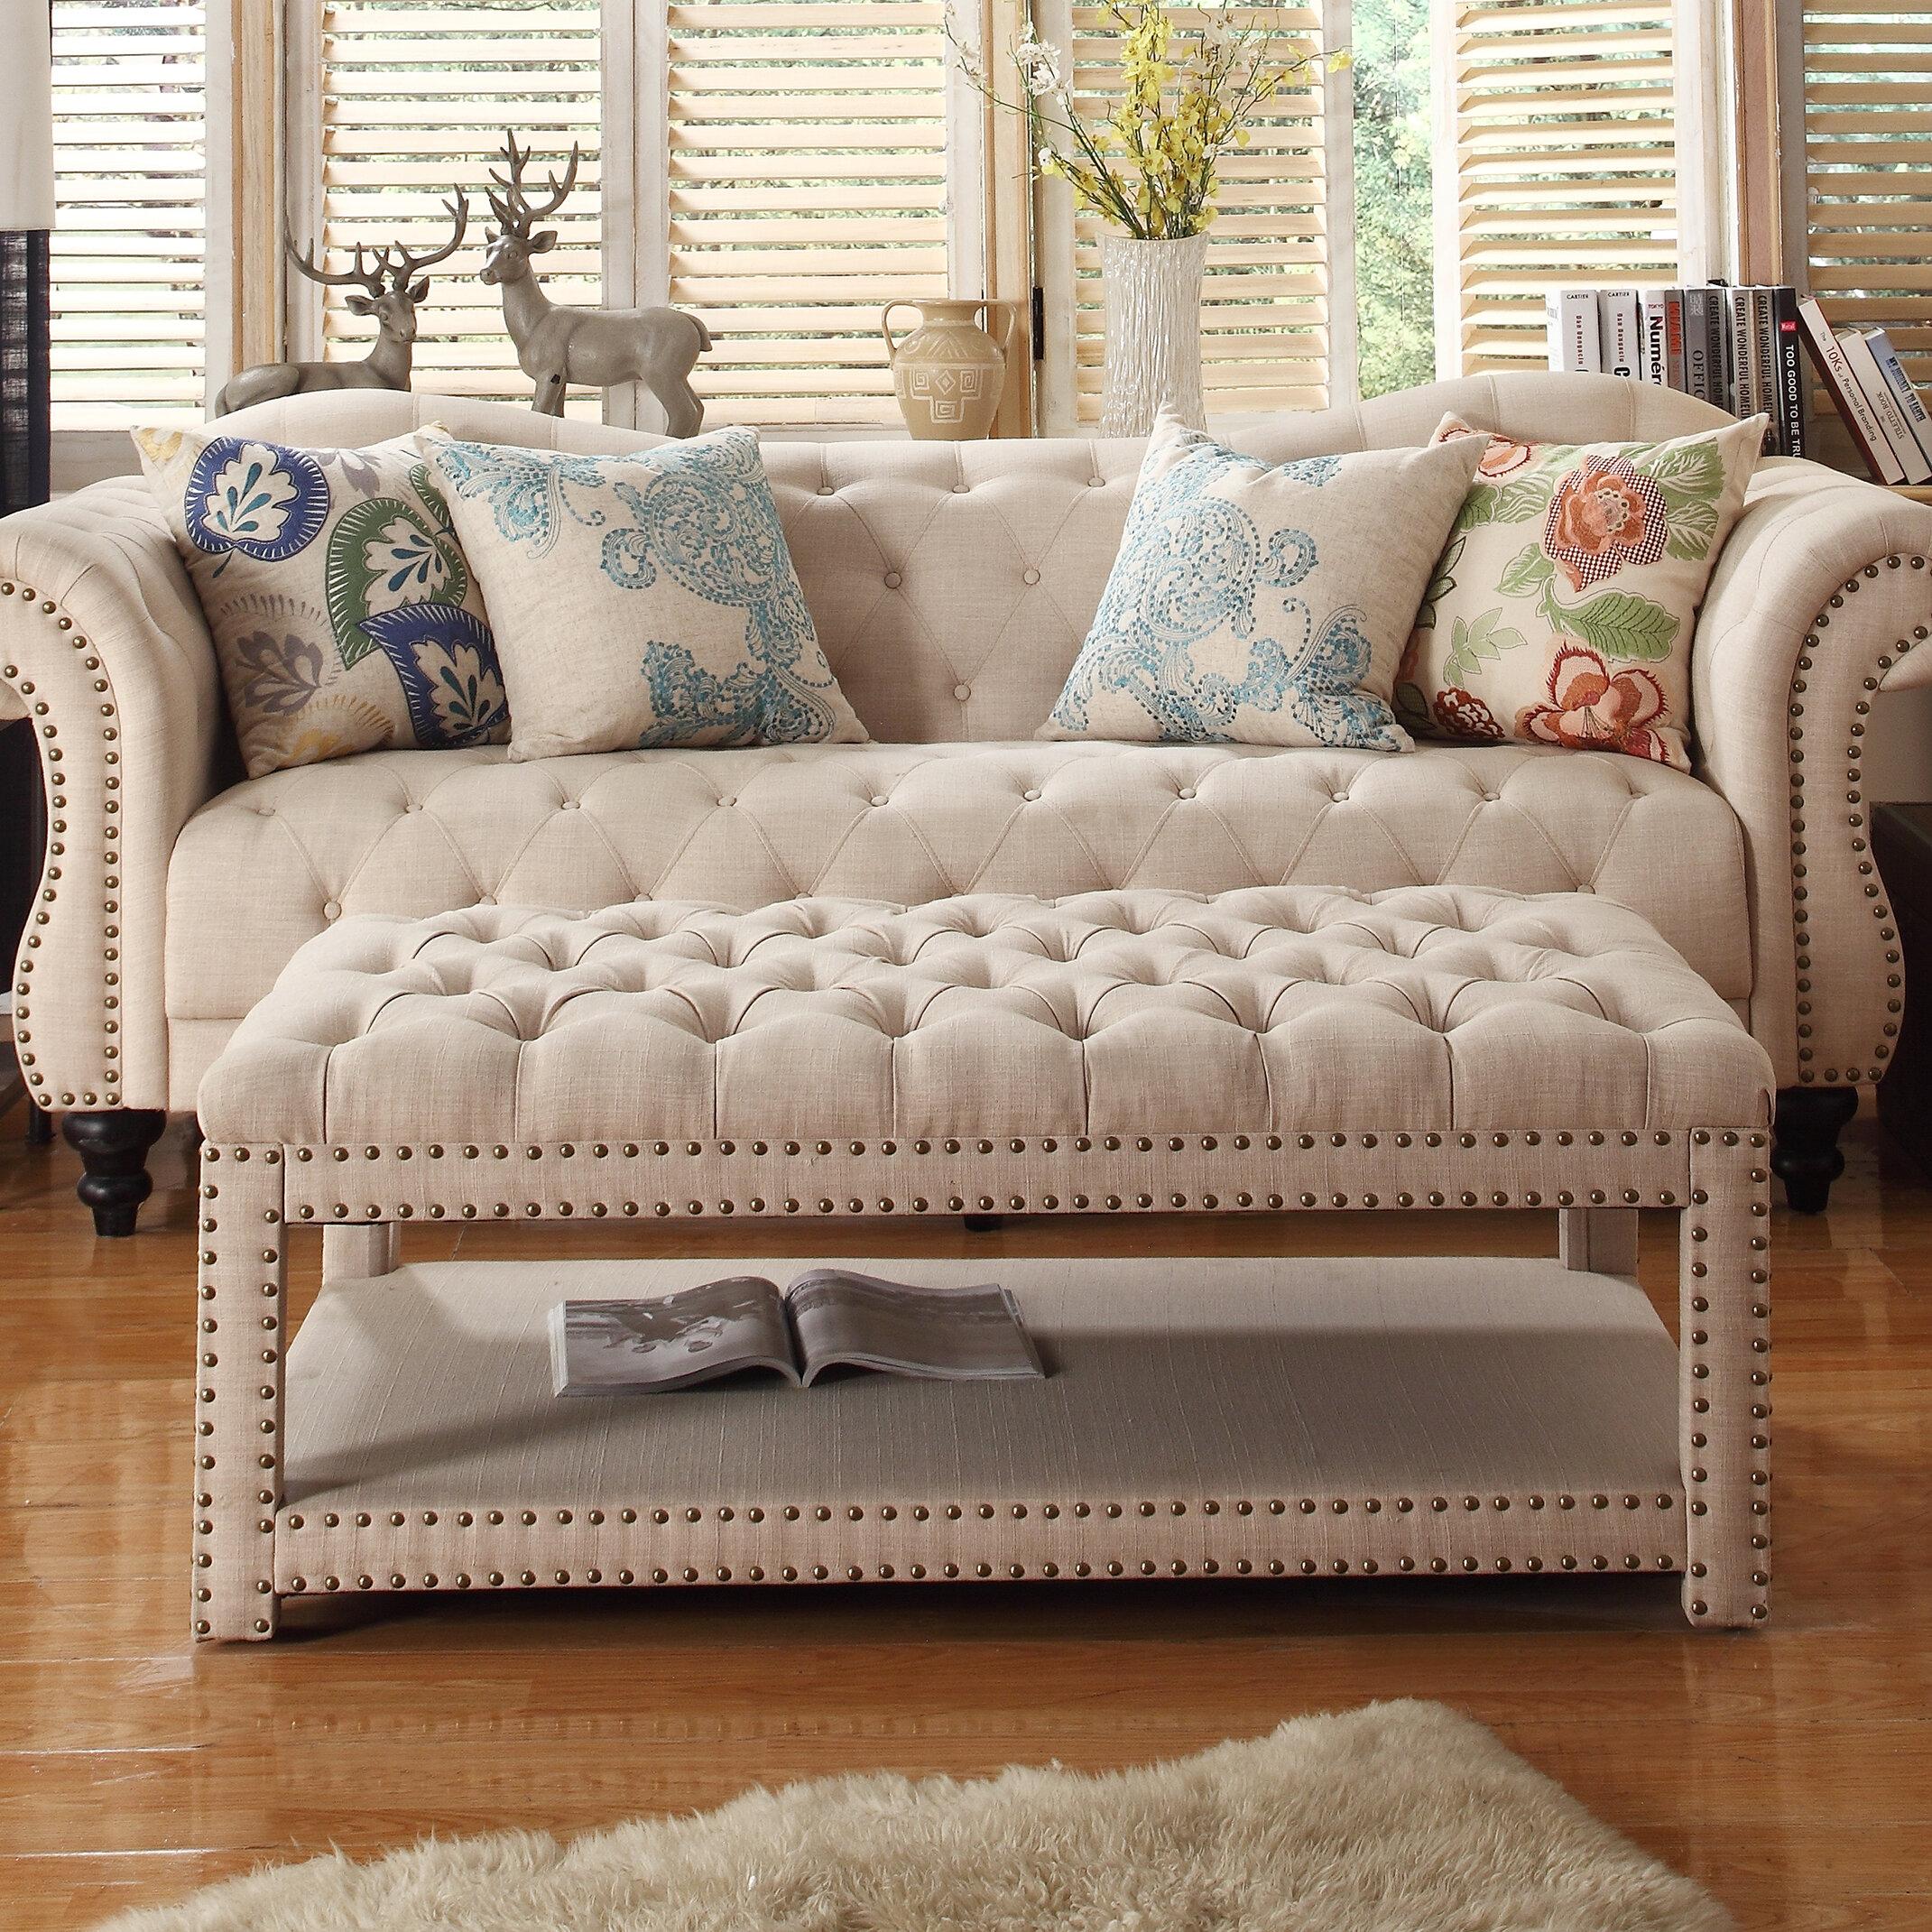 Miraculous Heidy Tufted Cocktail Storage Ottoman Short Links Chair Design For Home Short Linksinfo